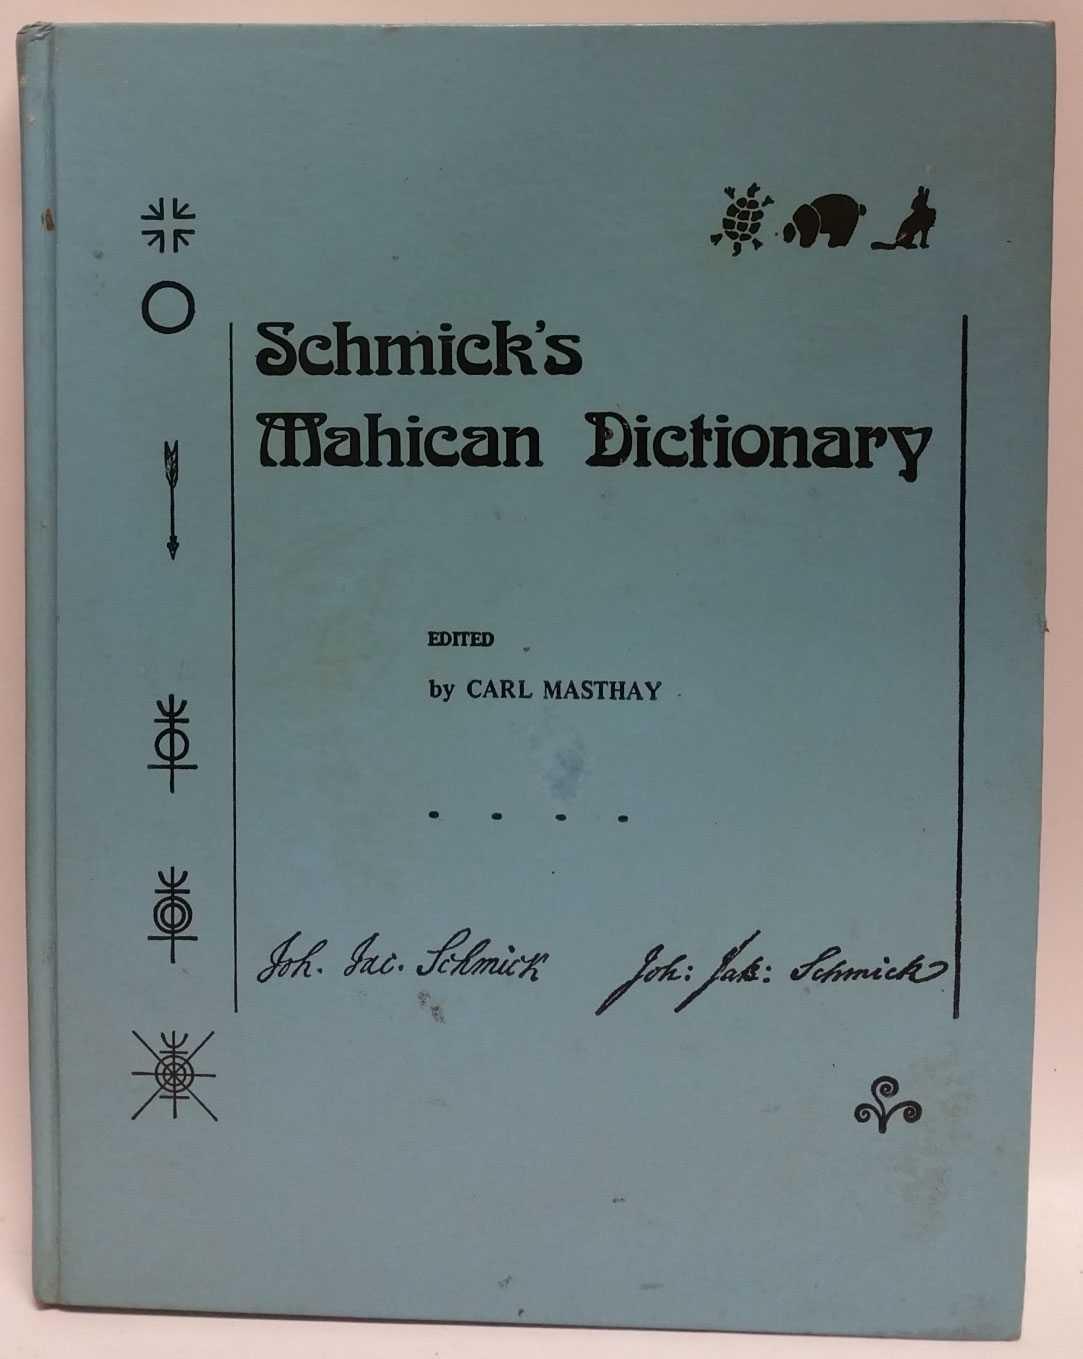 Schmick's Mahican Dictionary, Carl Masthay